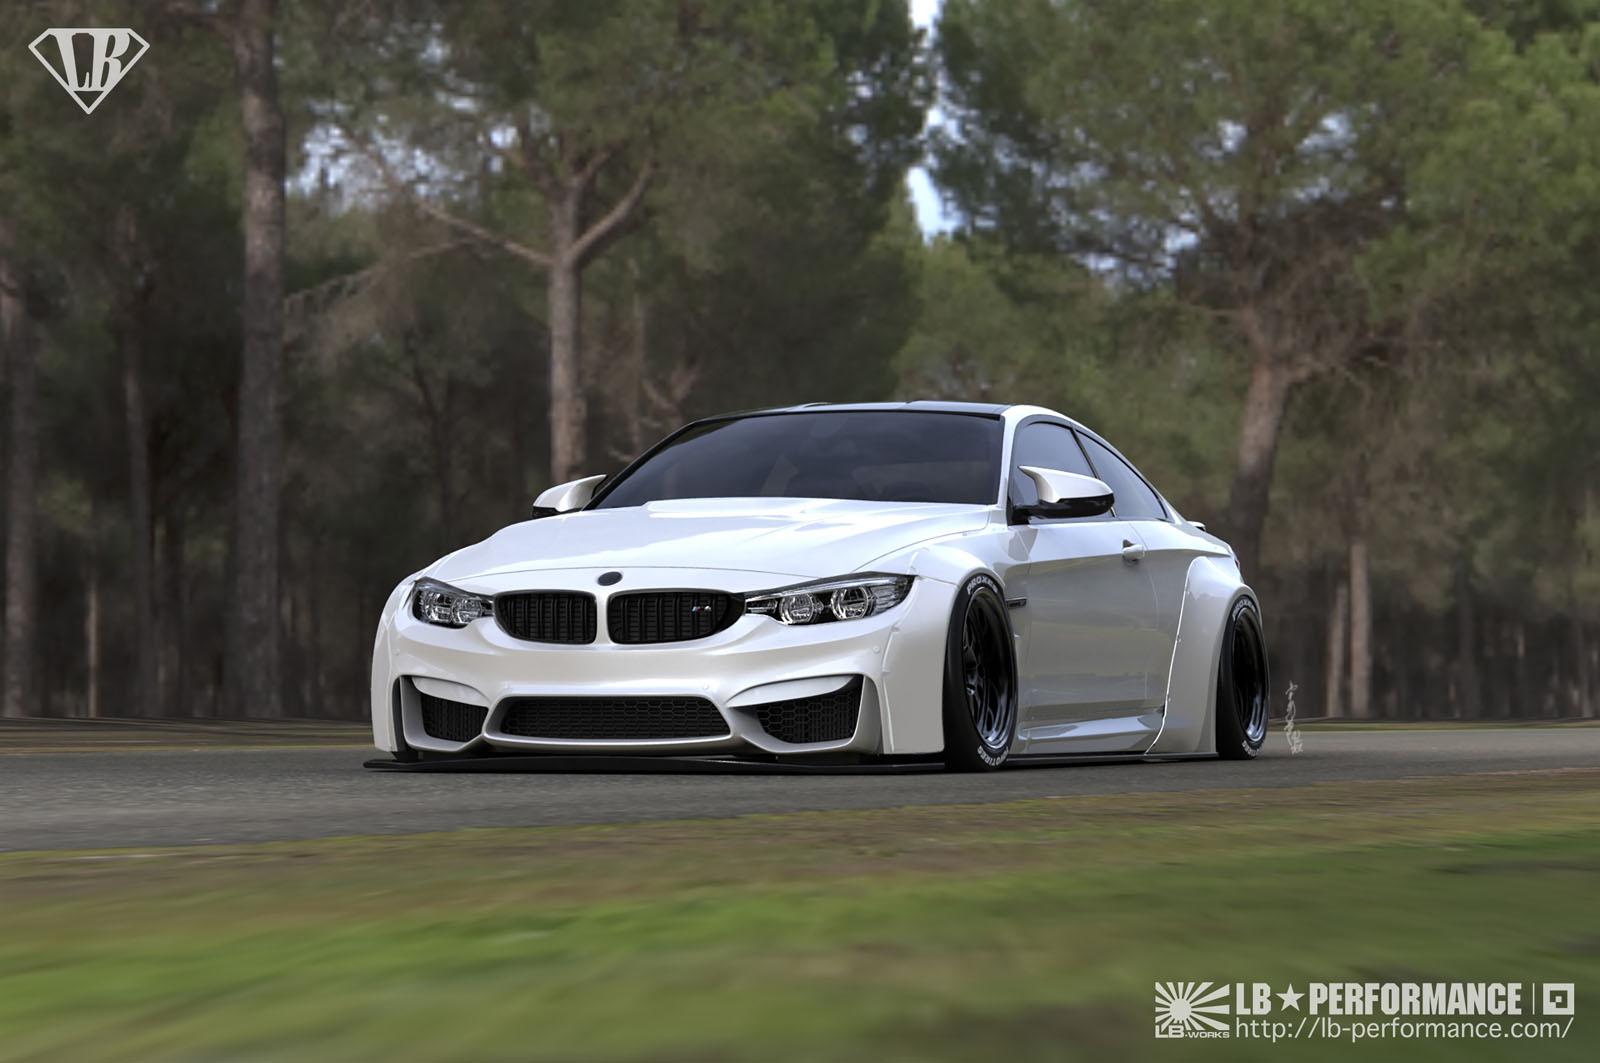 F82 BMW M4 by Liberty Walk